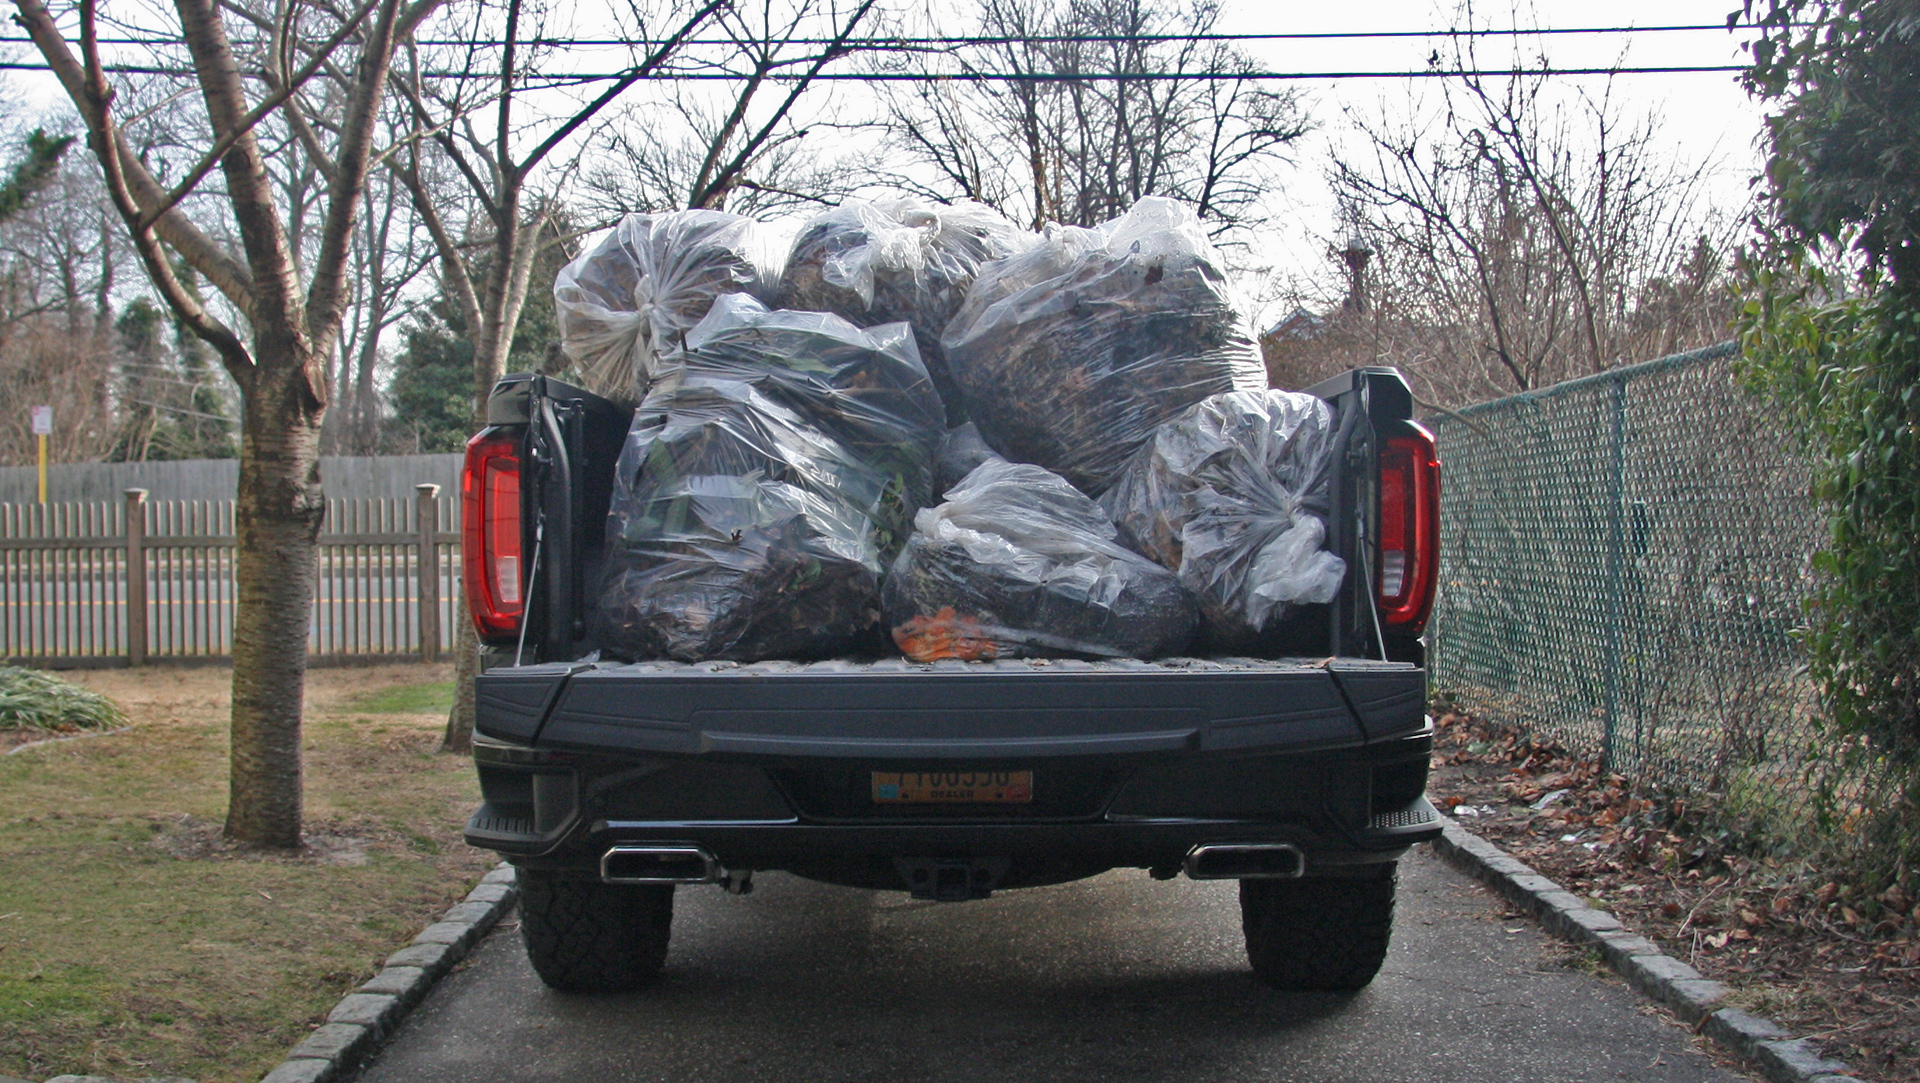 2019 GMC Sierra AT4 bed full of trash